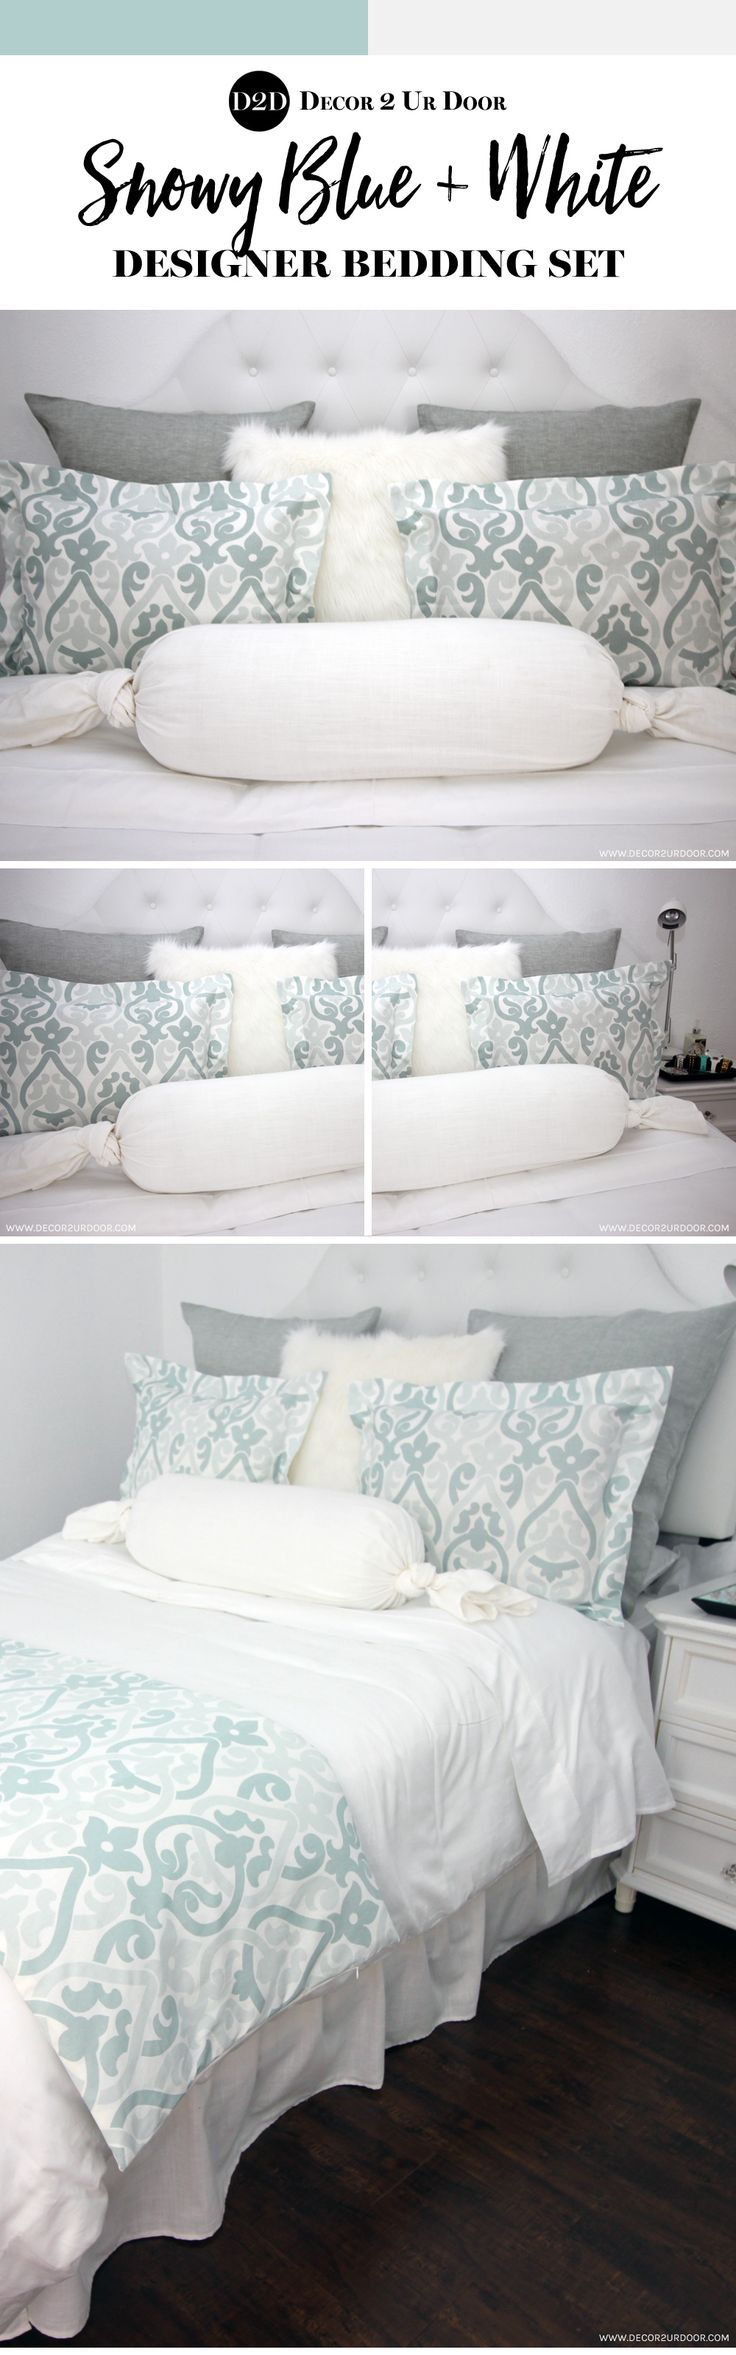 Master Bedroom Oasis 58 best master bedroom ideas images on pinterest | custom bedding